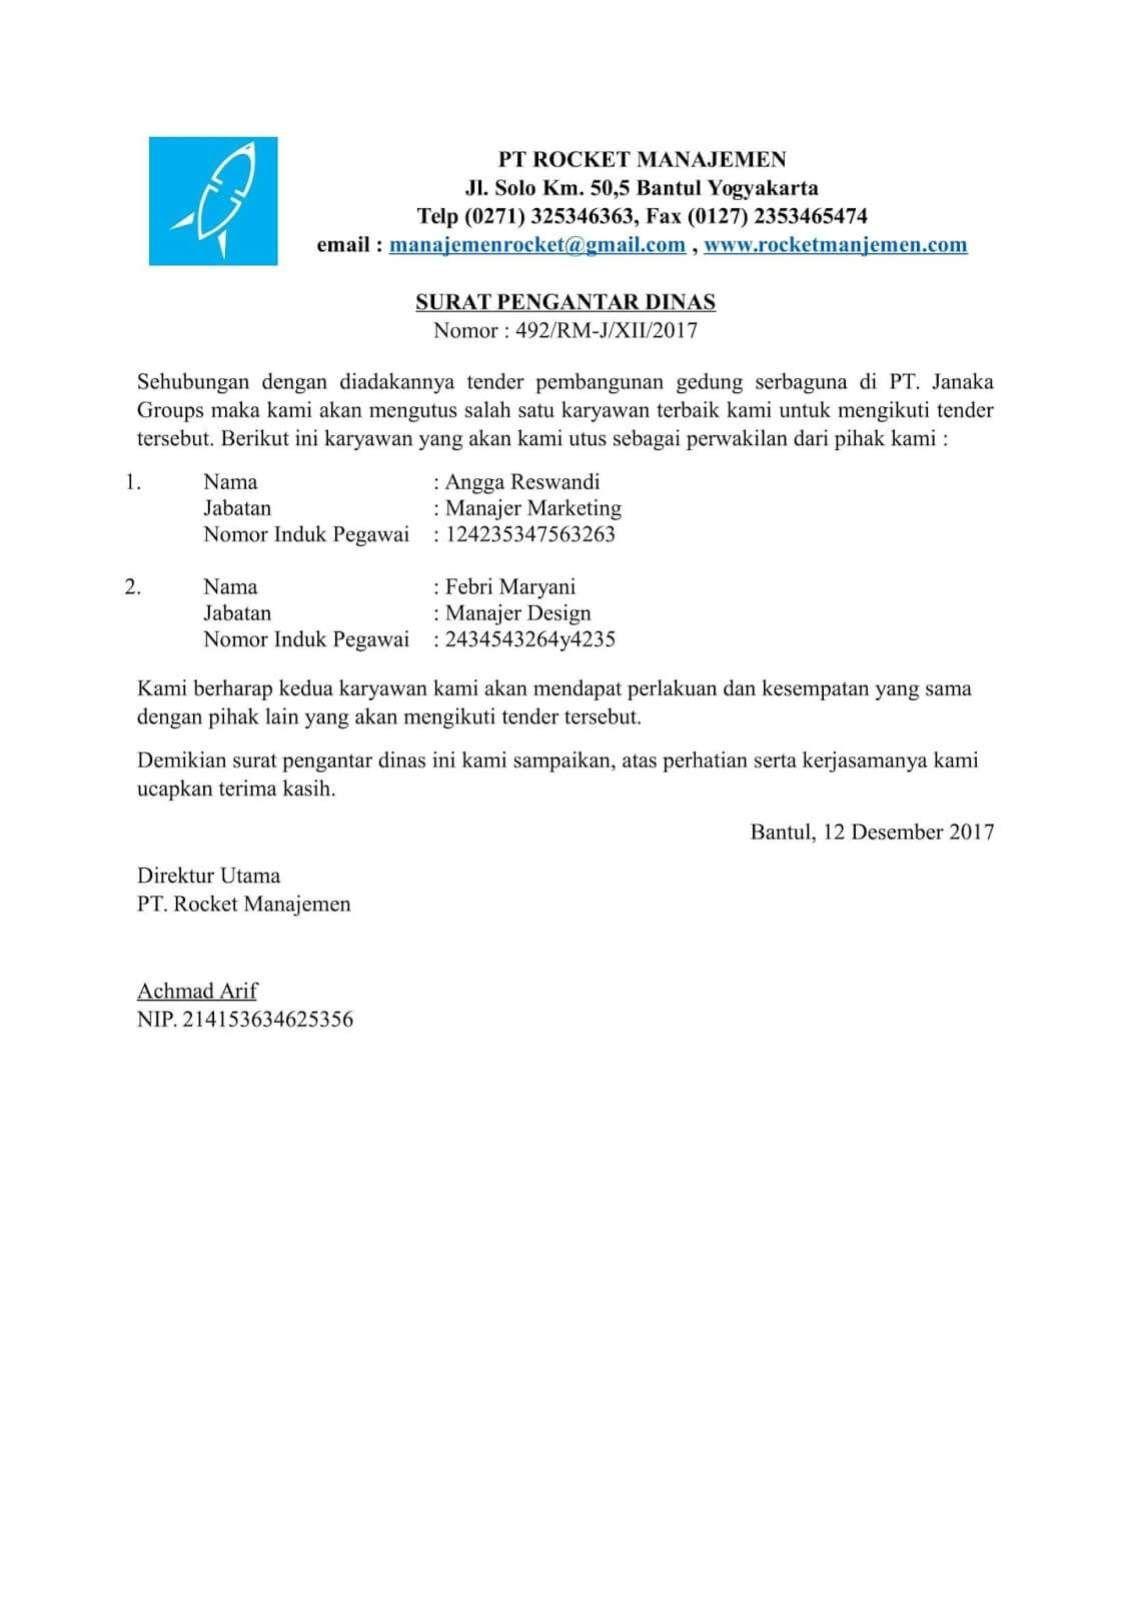 Contoh Surat Pengantar Dinas Surat Kop Surat Surat Pengantar